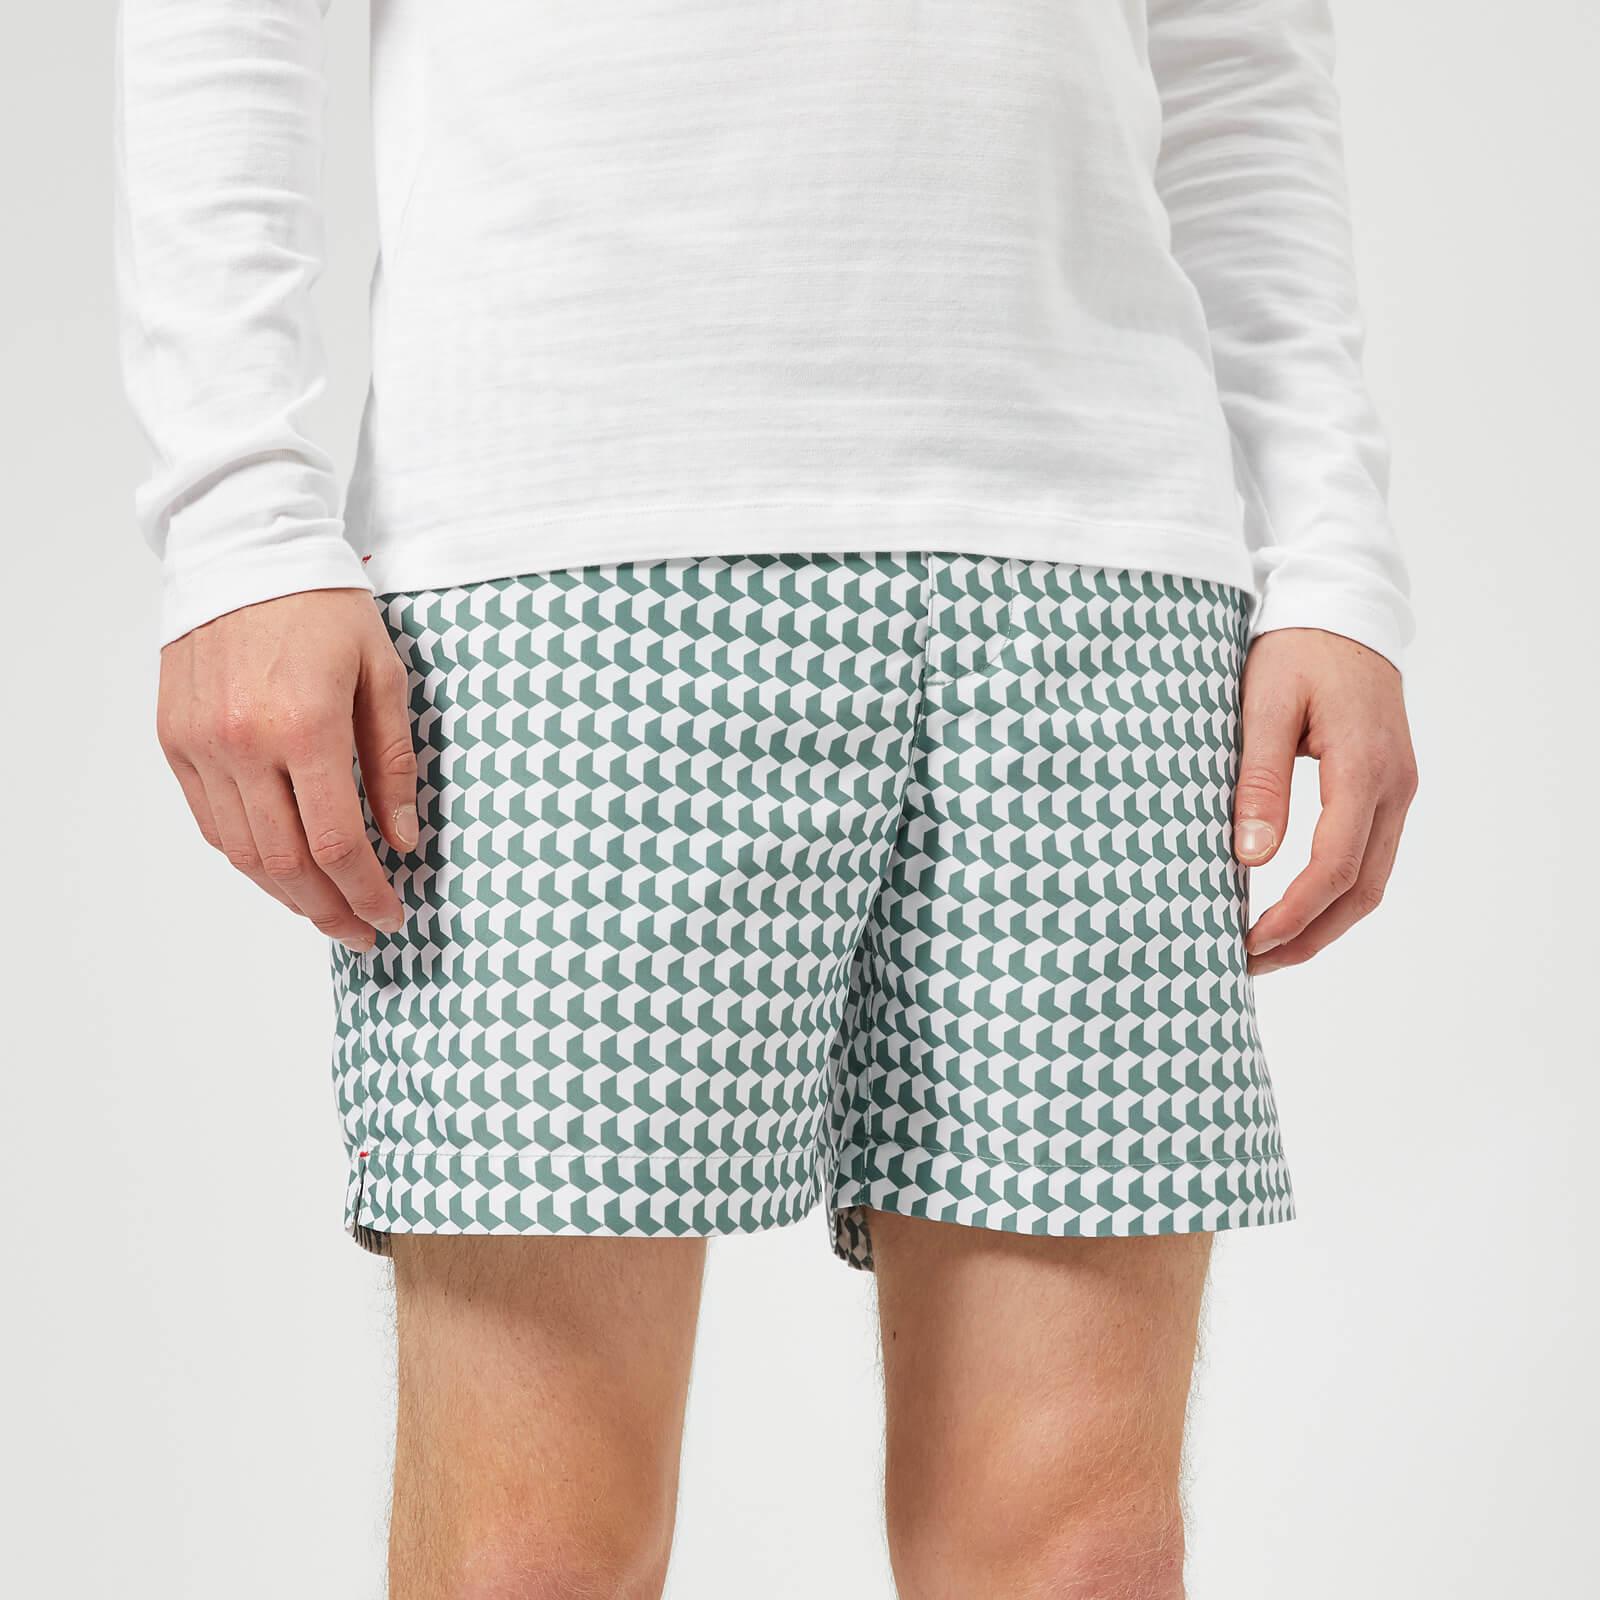 ce5090d6ef Orlebar Brown Men's Bulldog Aruba Swim Shorts - Blue - Free UK Delivery  over £50